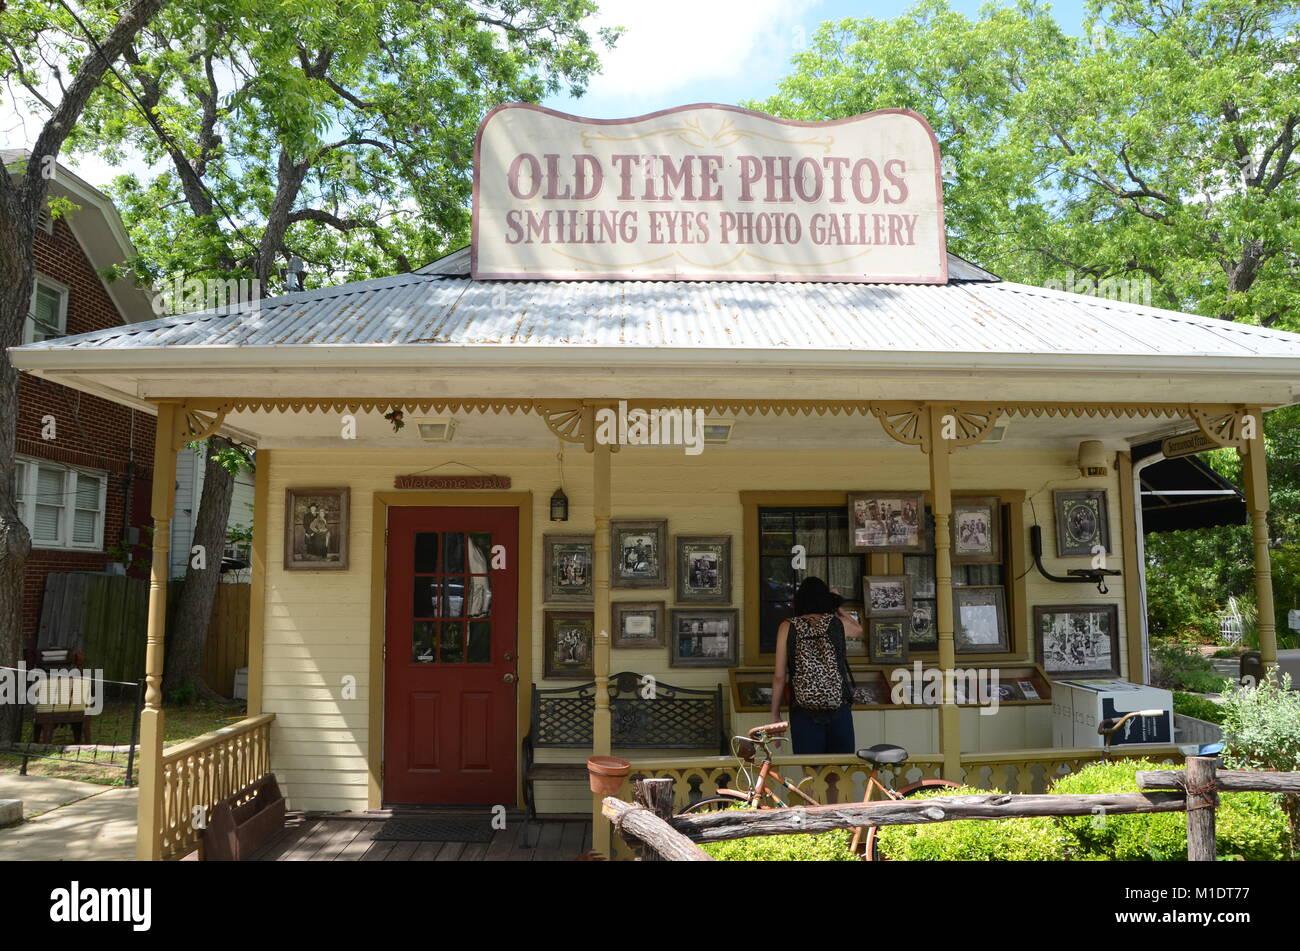 smiling eyes photo gallery, old time photos, gruene texas USA - Stock Image